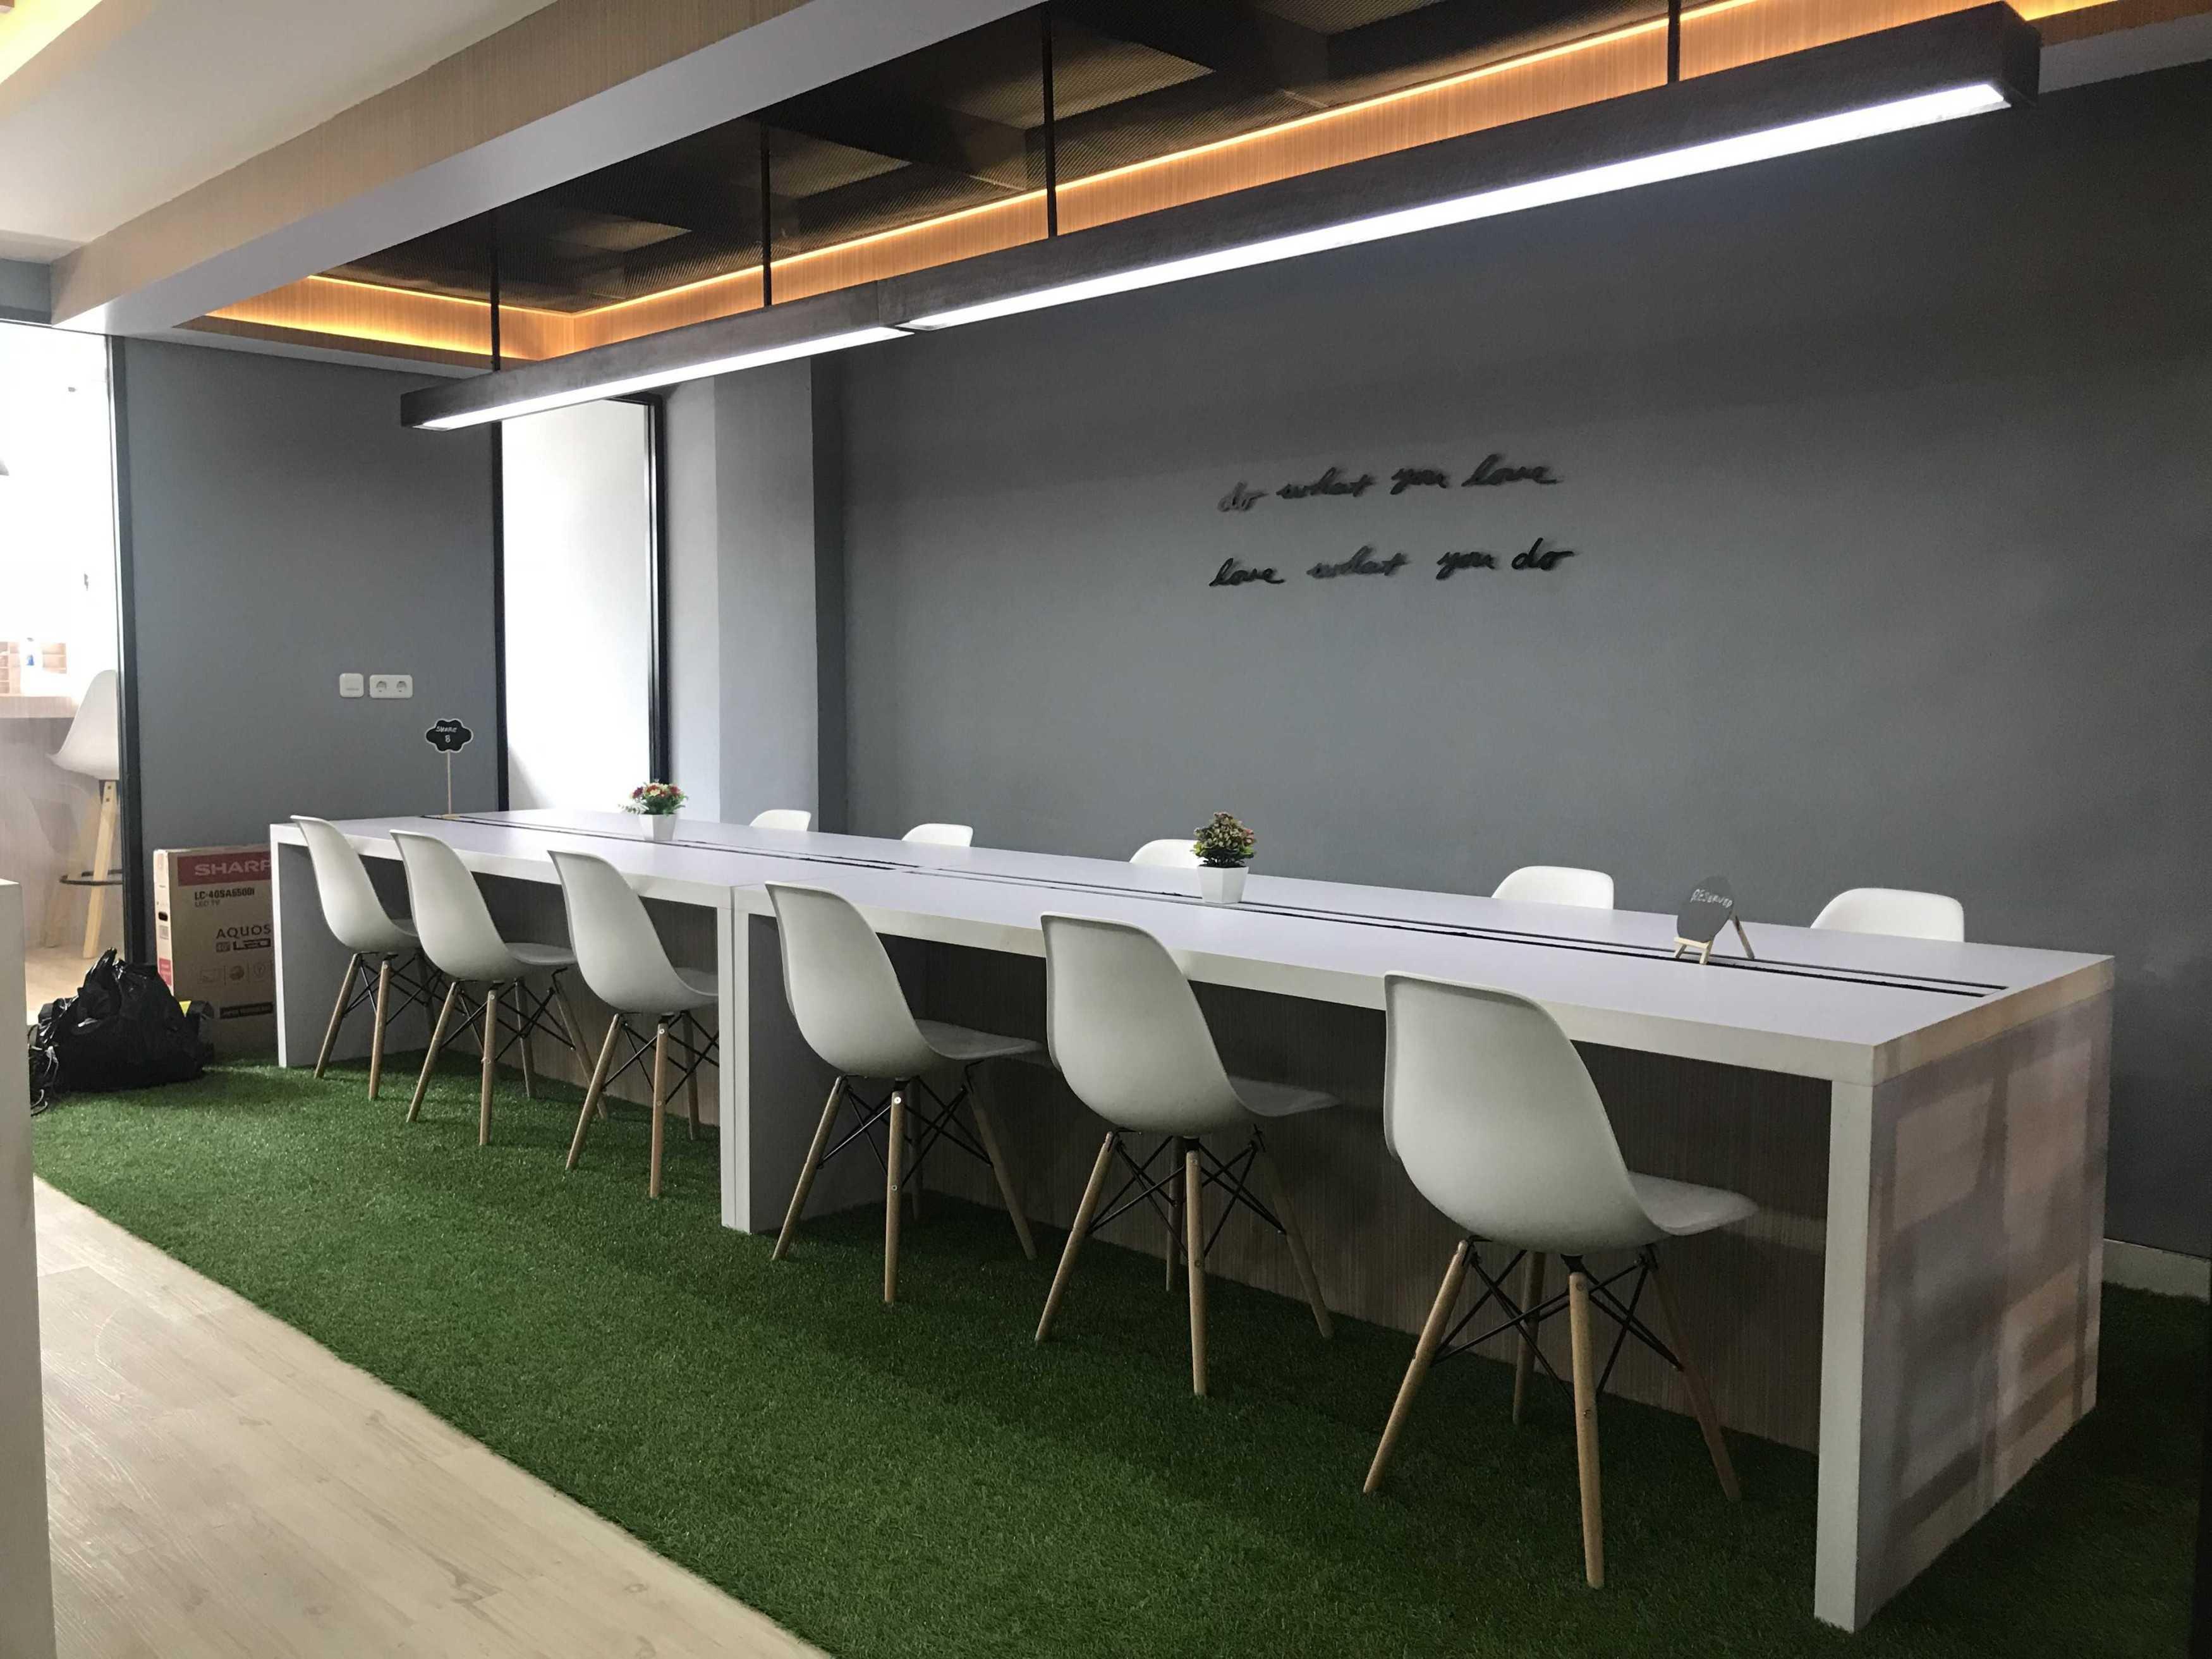 Ada Design Studio Office Plus Jl. Tj. Duren Timur 2 No.40-75, Rt.12/rw.1, Tj. Duren Sel., Grogol Petamburan, Kota Jakarta Barat, Daerah Khusus Ibukota Jakarta 11470, Indonesia Jl. Tj. Duren Timur 2 No.40-75, Rt.12/rw.1, Tj. Duren Sel., Grogol Petamburan, Kota Jakarta Barat, Daerah Khusus Ibukota Jakarta 11470, Indonesia Ada-Home-Office-Plus   68987